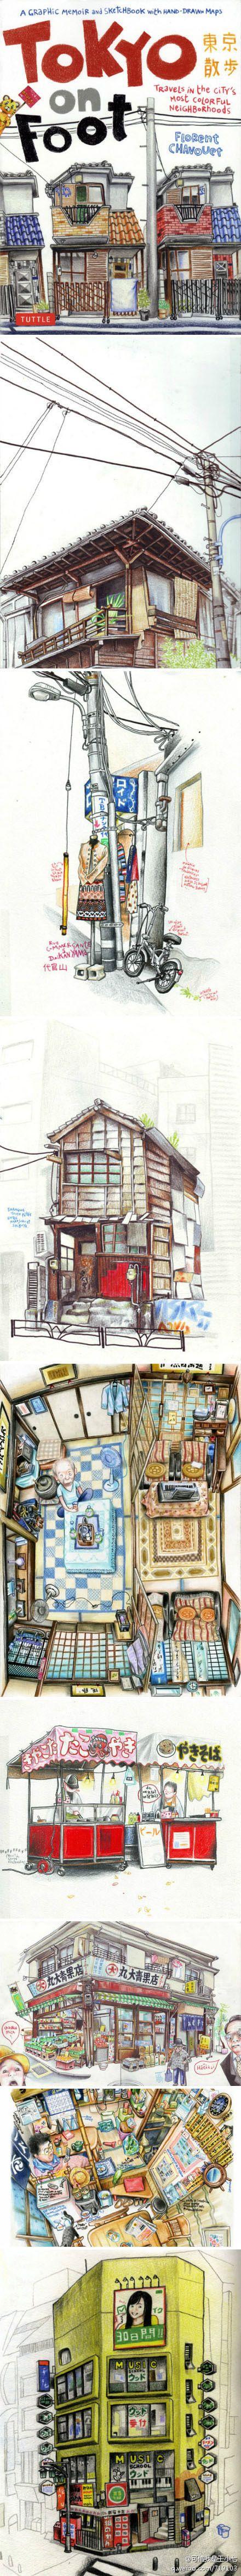 Tokyo on Foot | Florent Chavouet